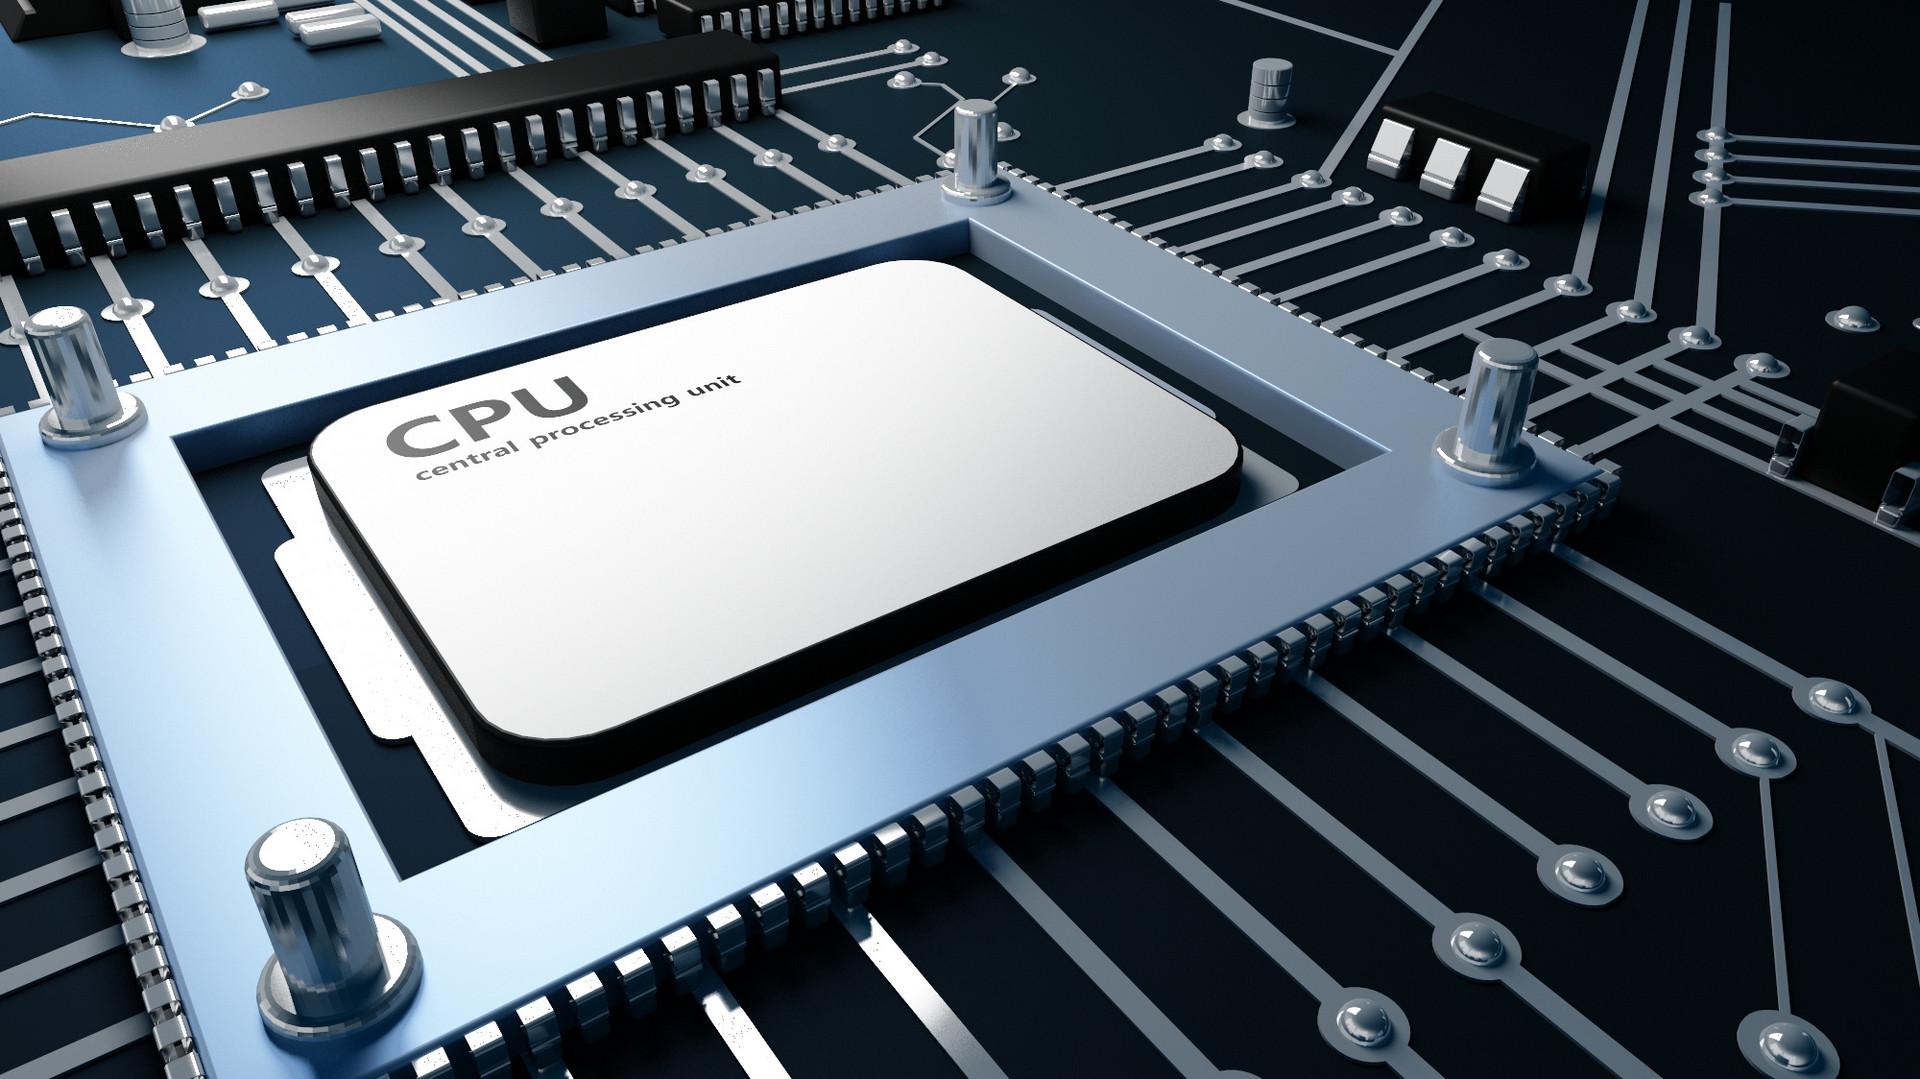 A13处理器曝光:苹果启用全新R1协处理器